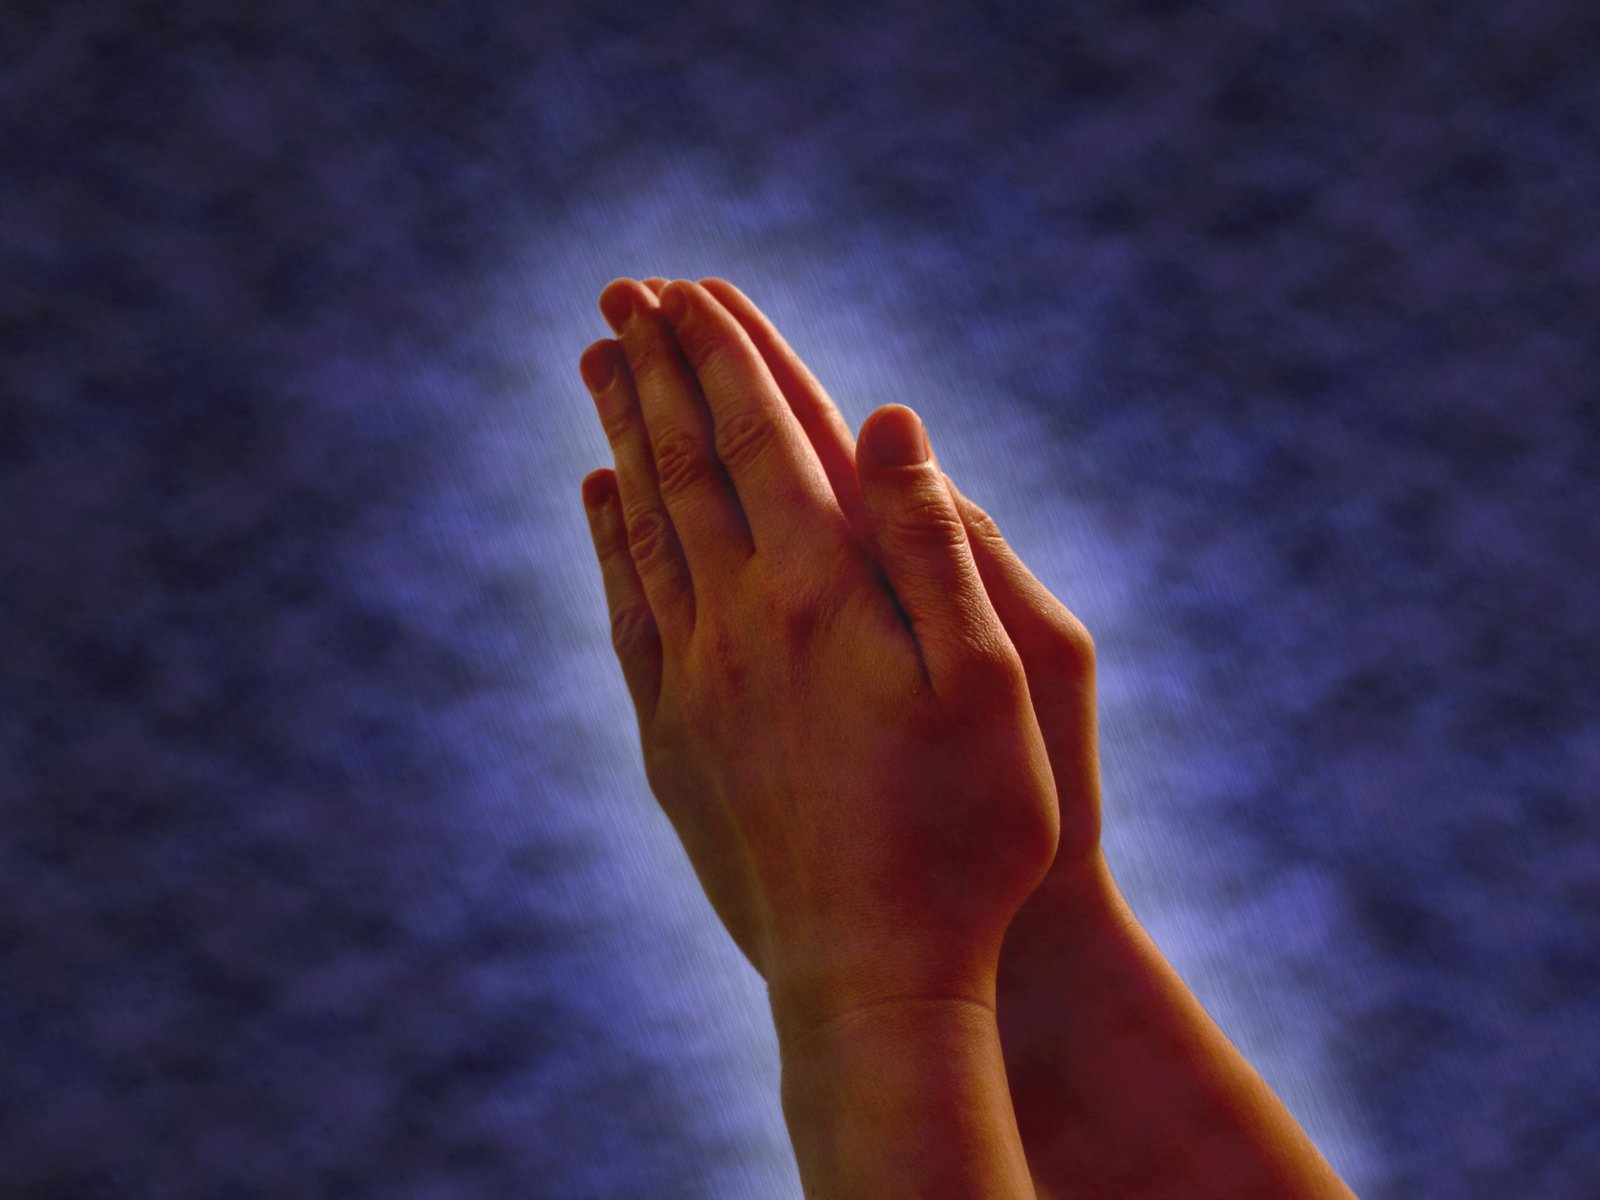 praying-hands-1179301